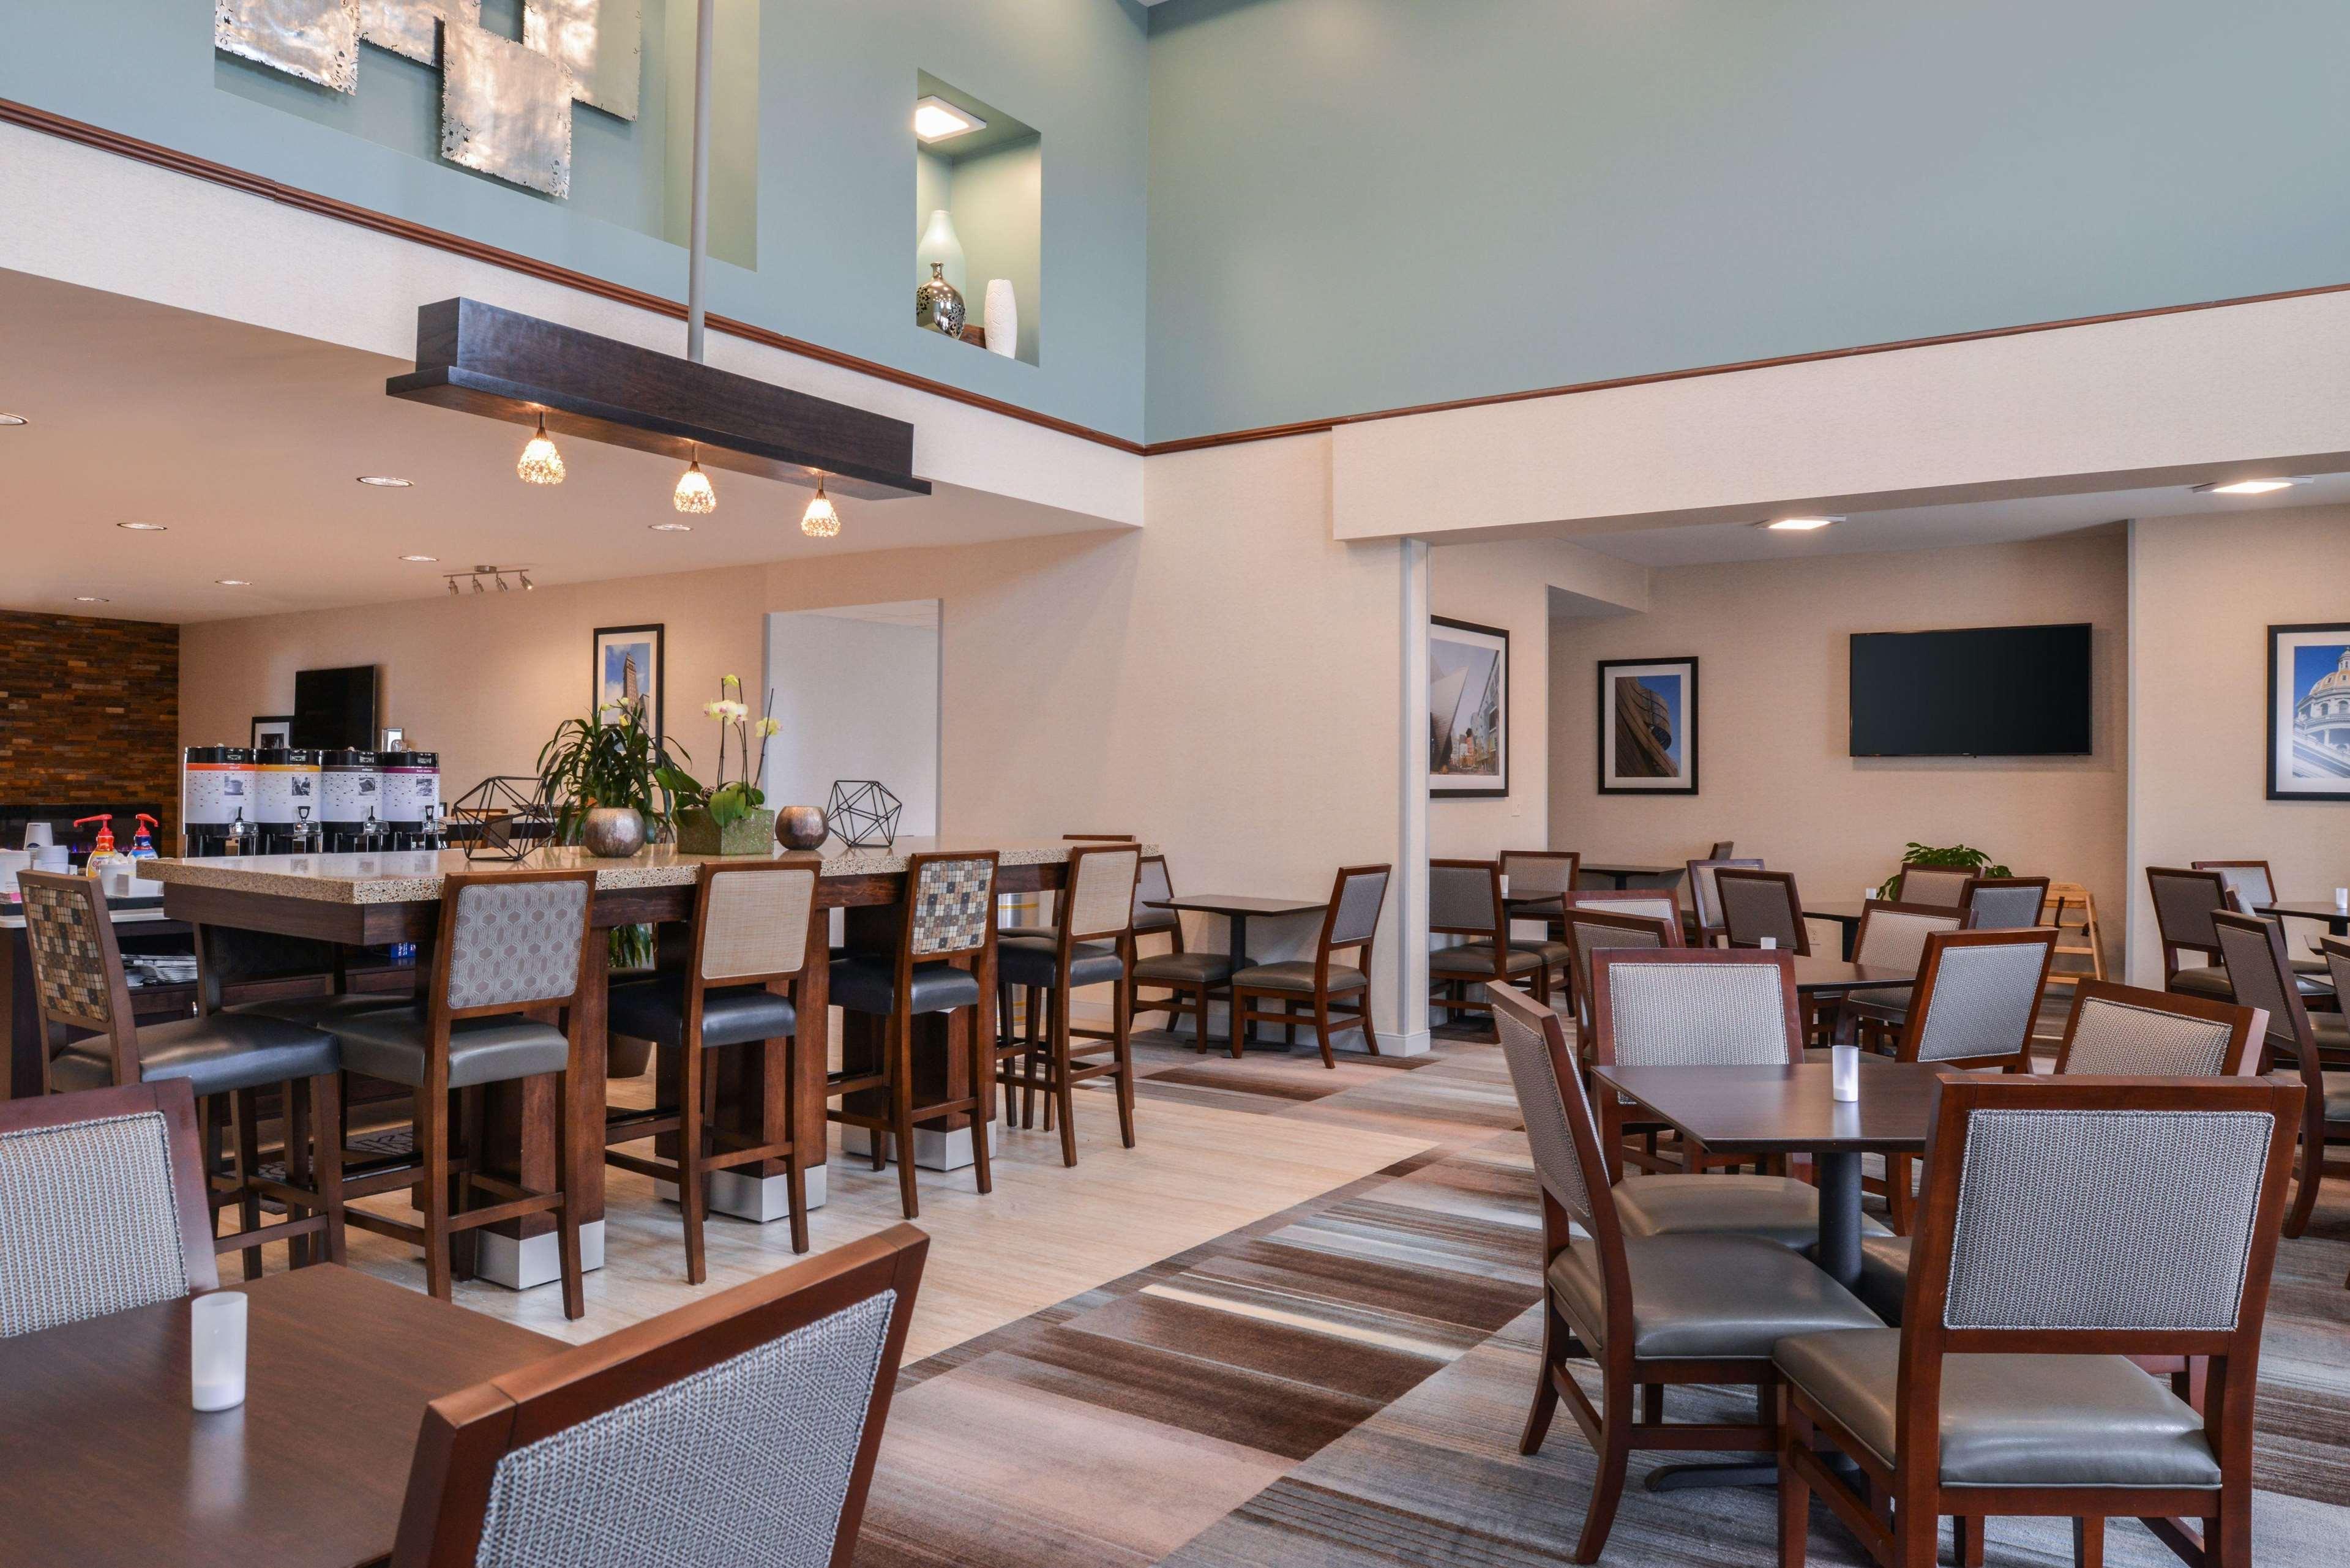 Hampton Inn & Suites Denver-Speer Boulevard image 14